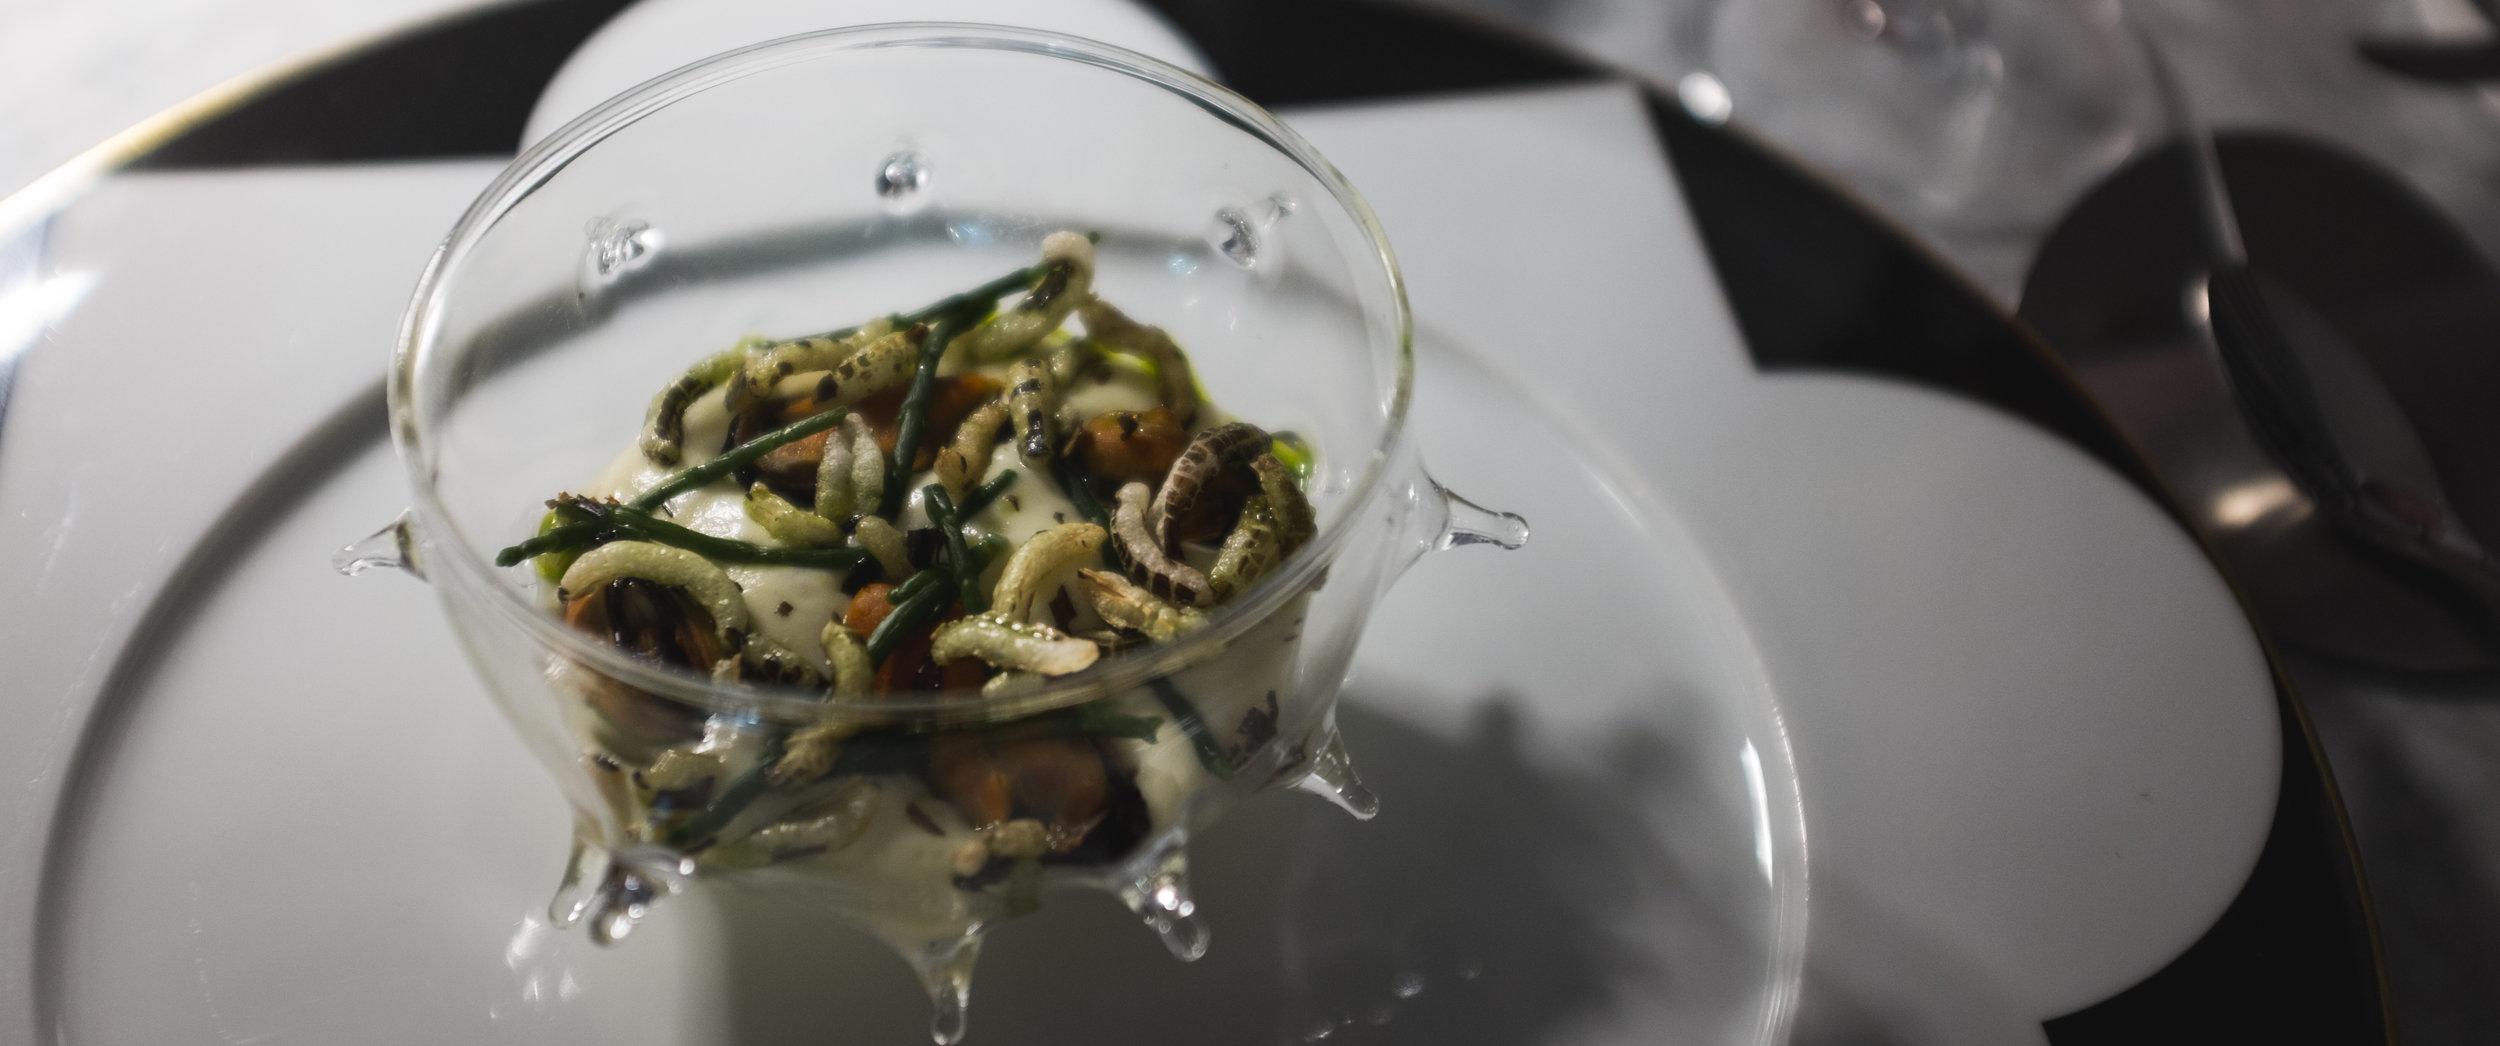 Felix Lo Basso. Sūrio putėsiai su jūros šparagais ir ryžių spragėsiais.  Felix Lo Basso. Mousse with cheese, sea asparagus and puffed rice.